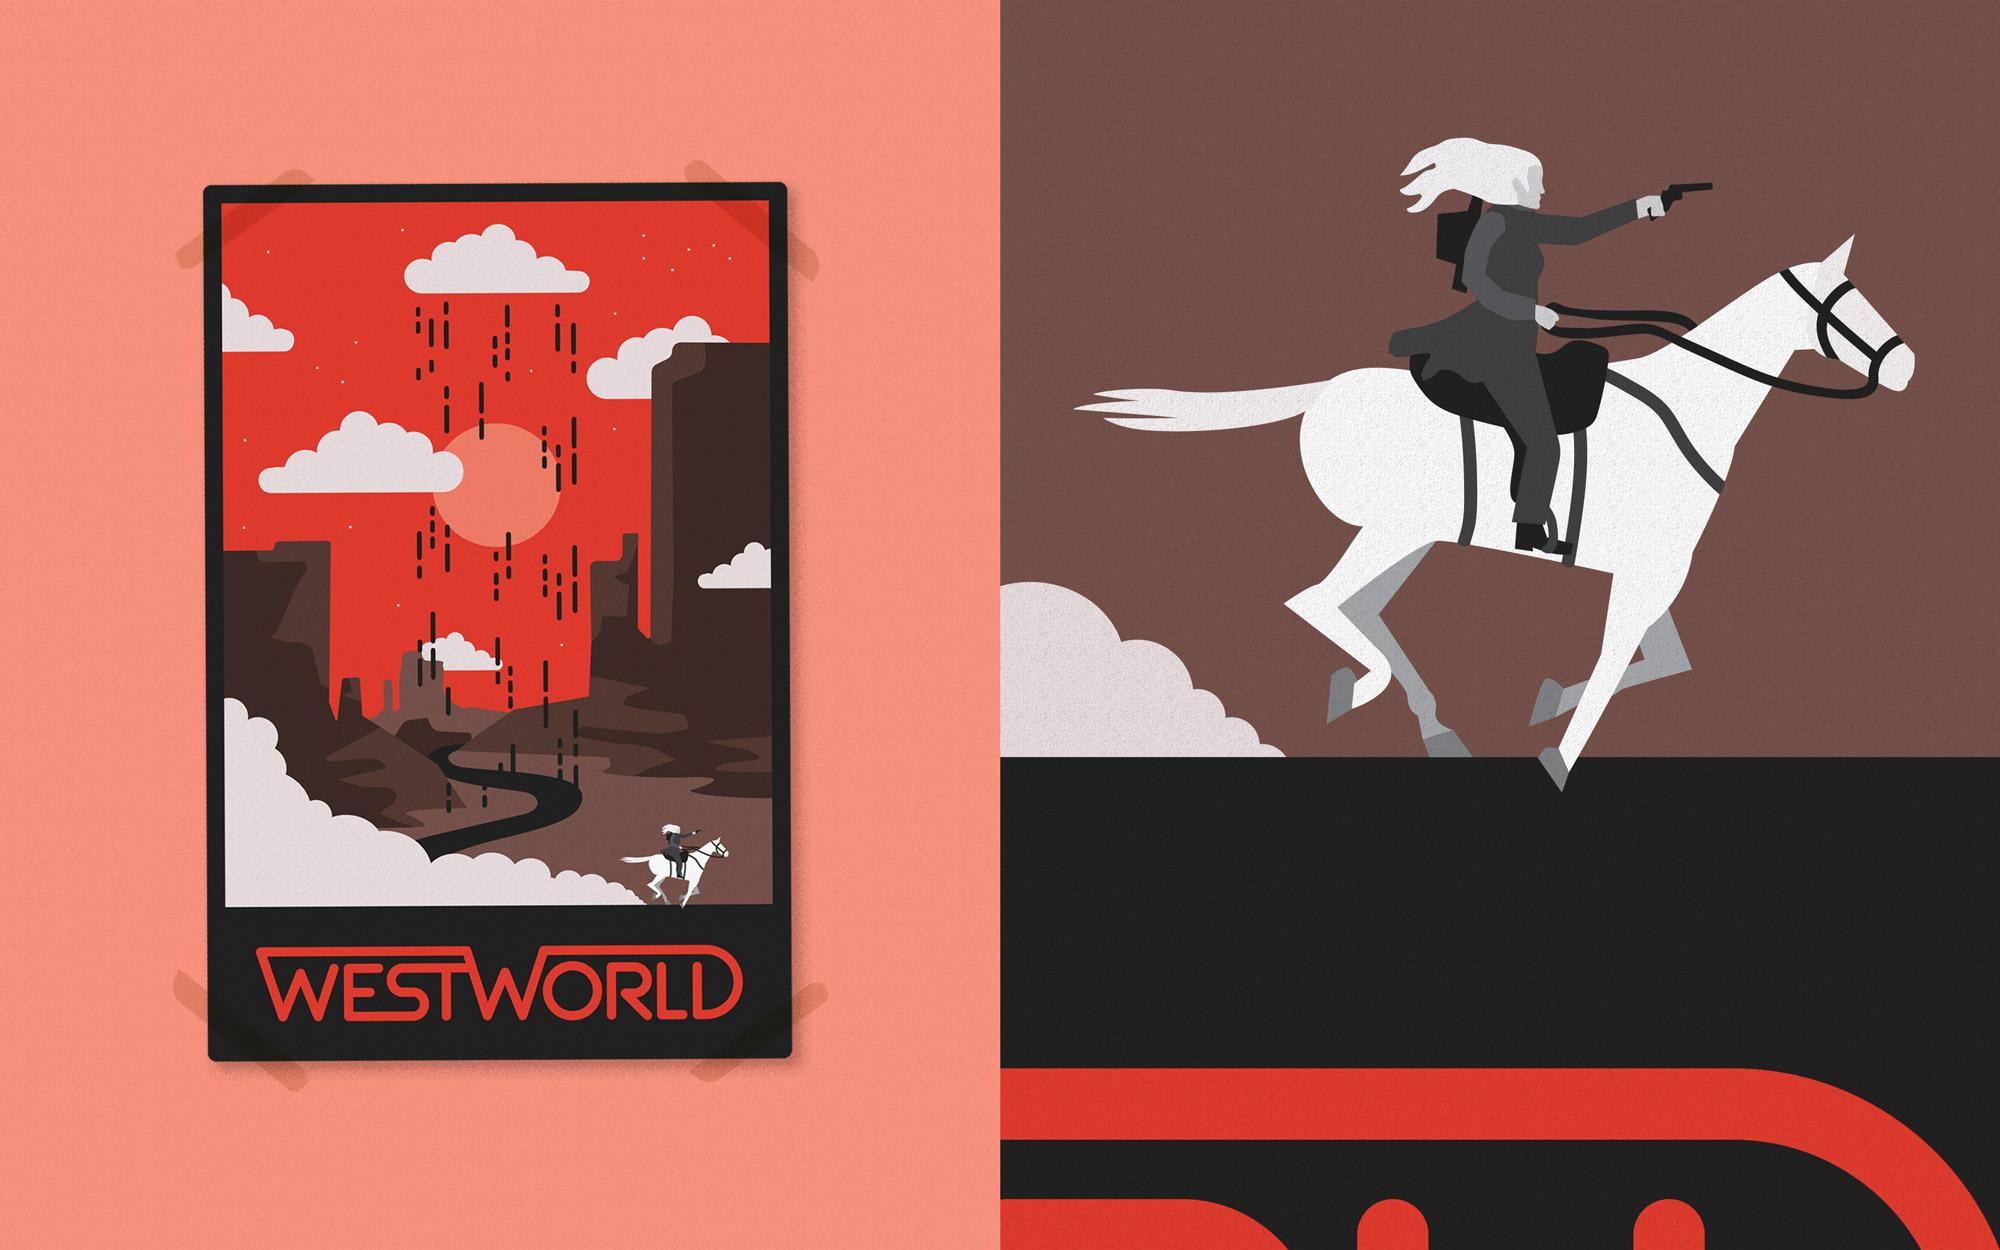 Carra-Sykes-Westworld.jpg